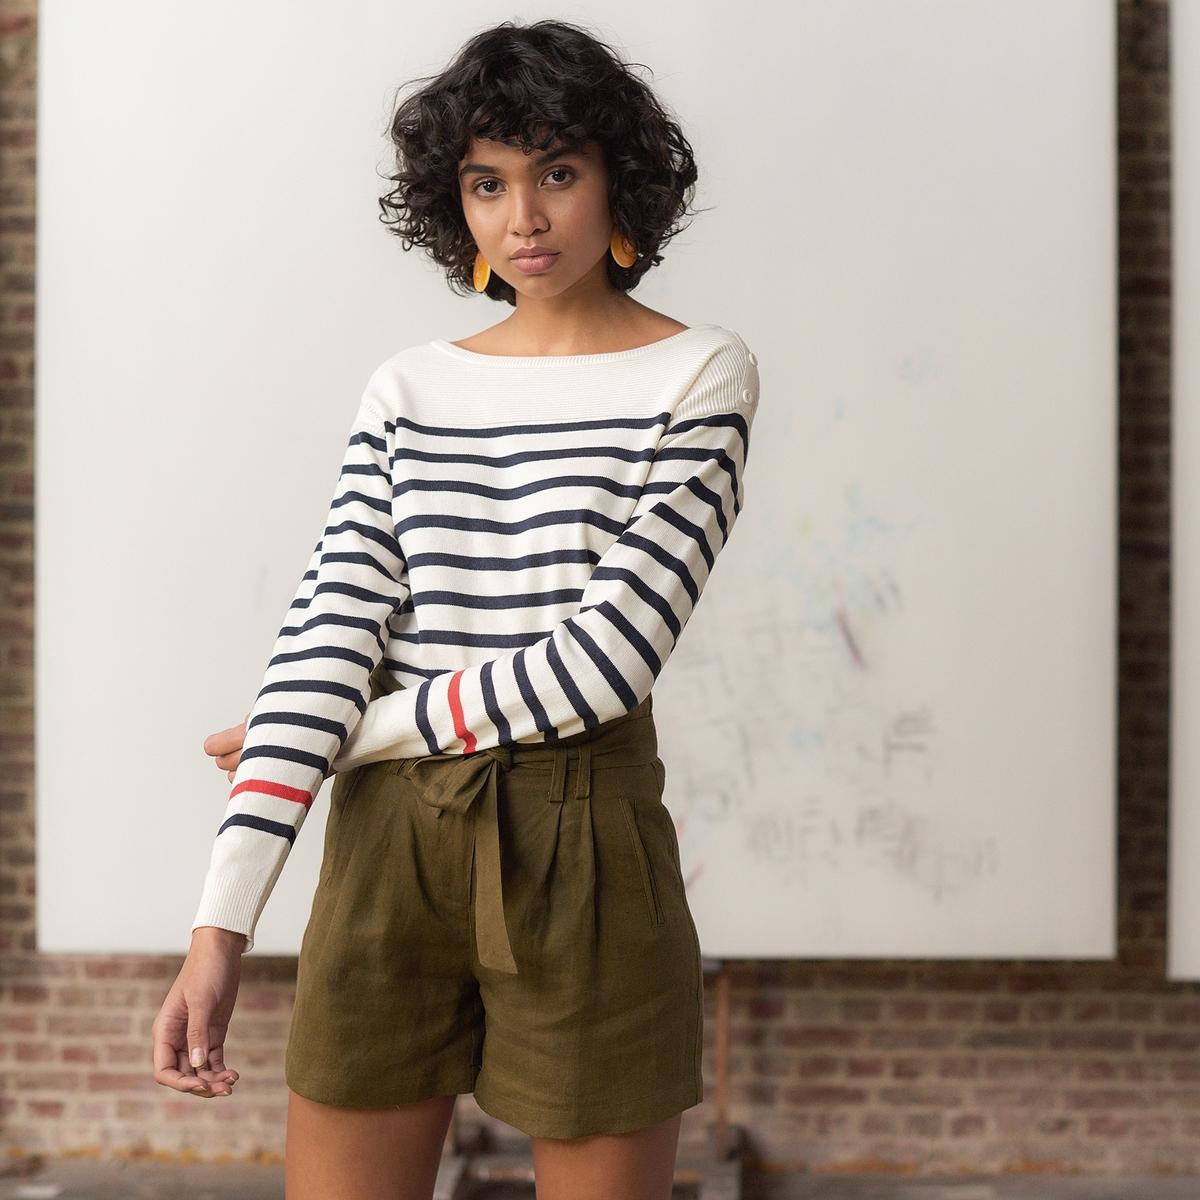 Camisola estilo marinheiro, gola redonda, mangas compridas